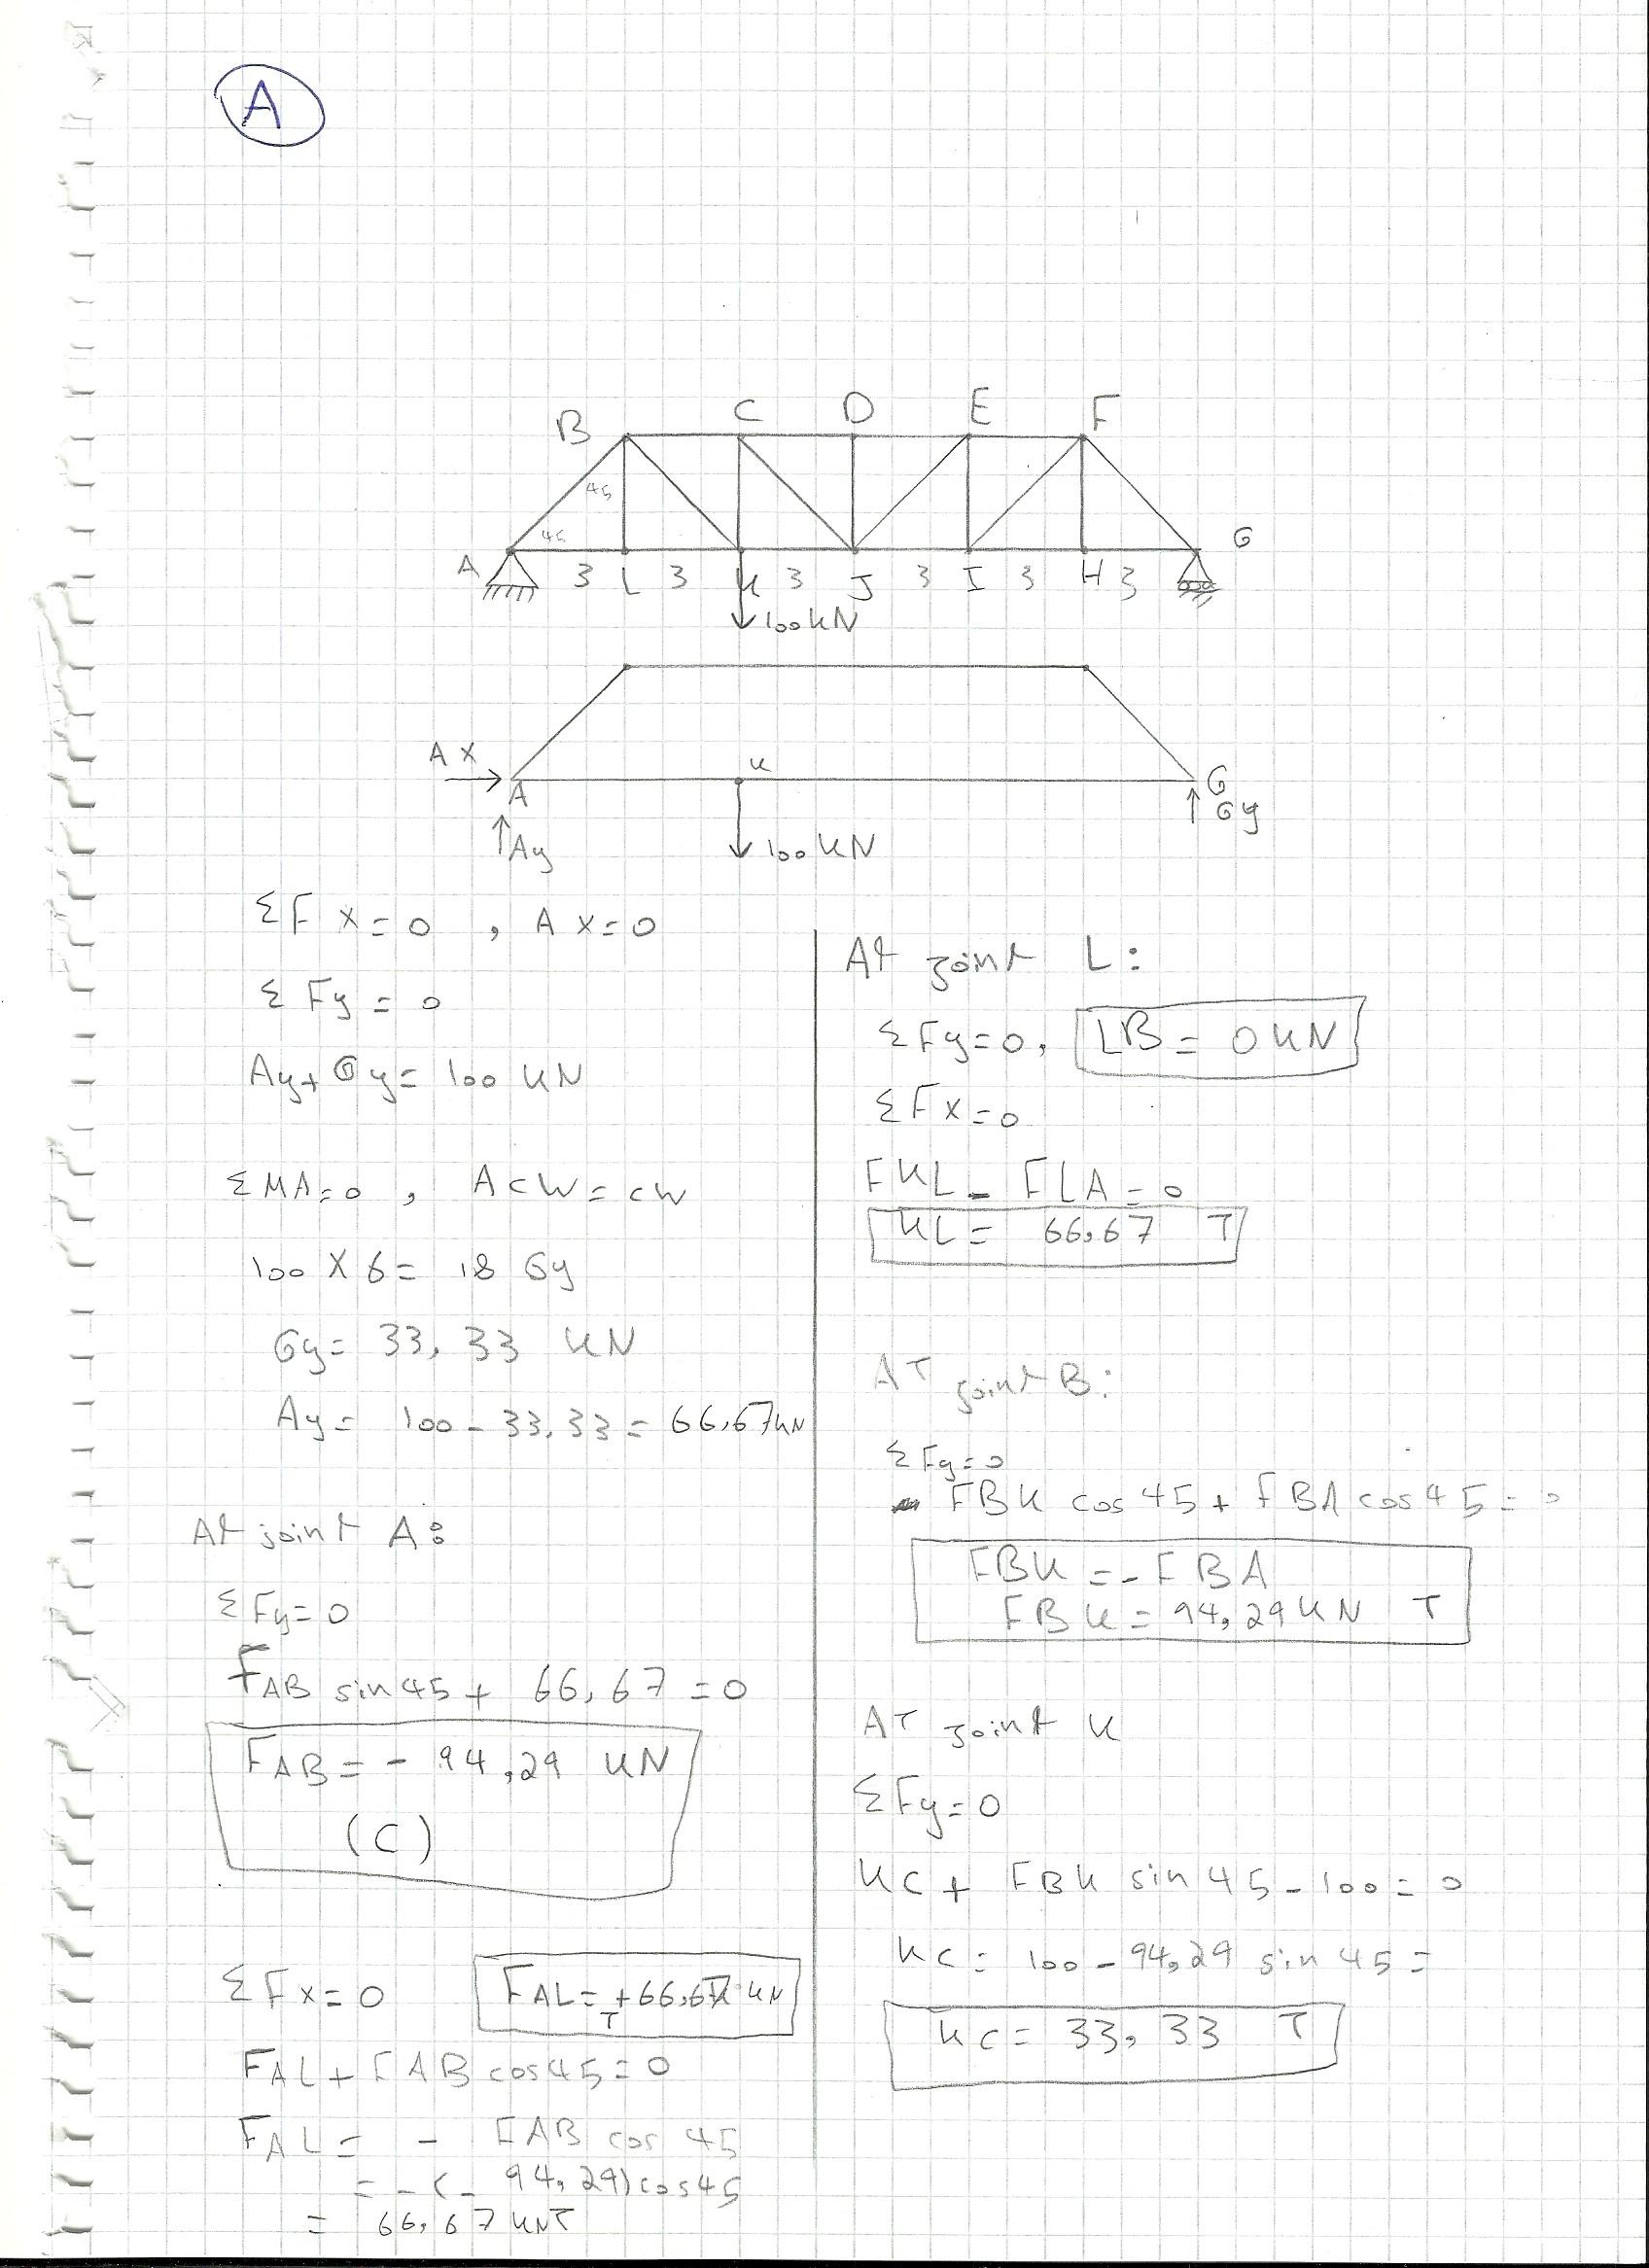 Part 1a Initial Design